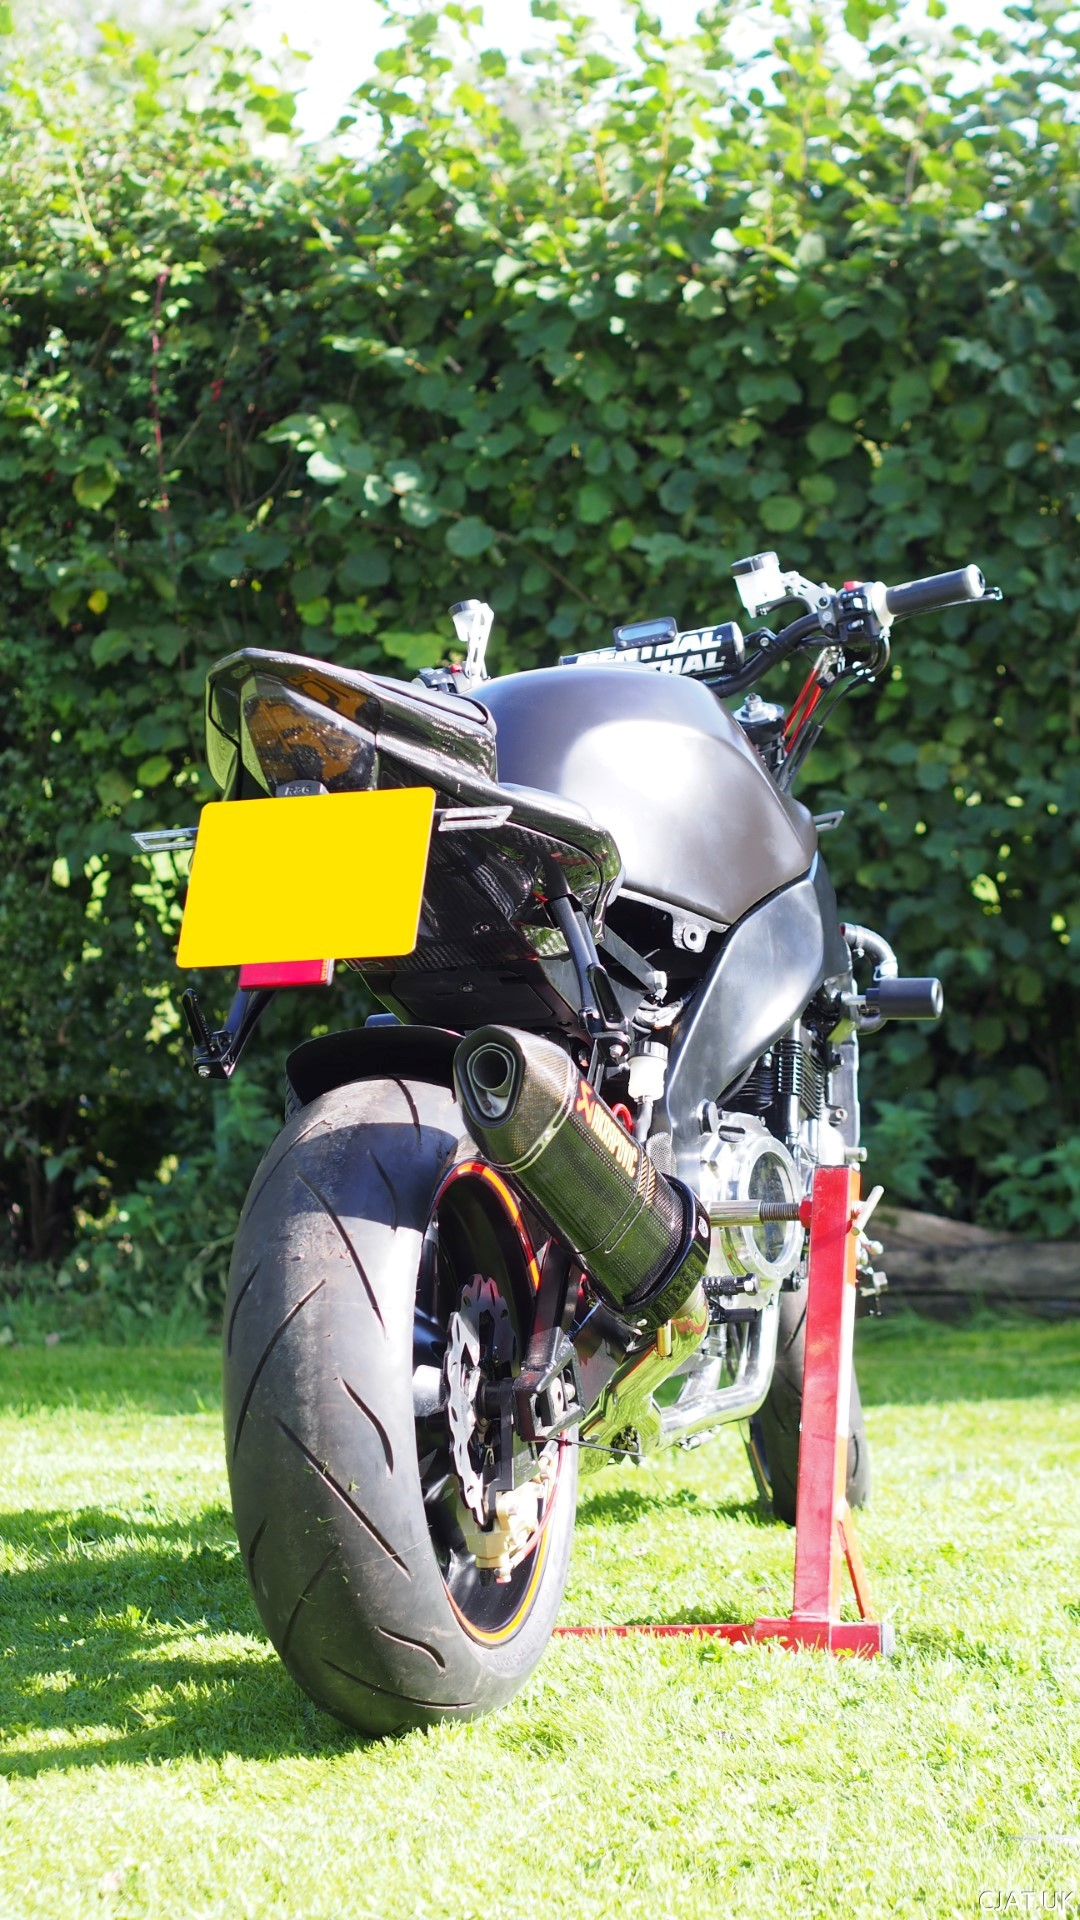 RF900 rear